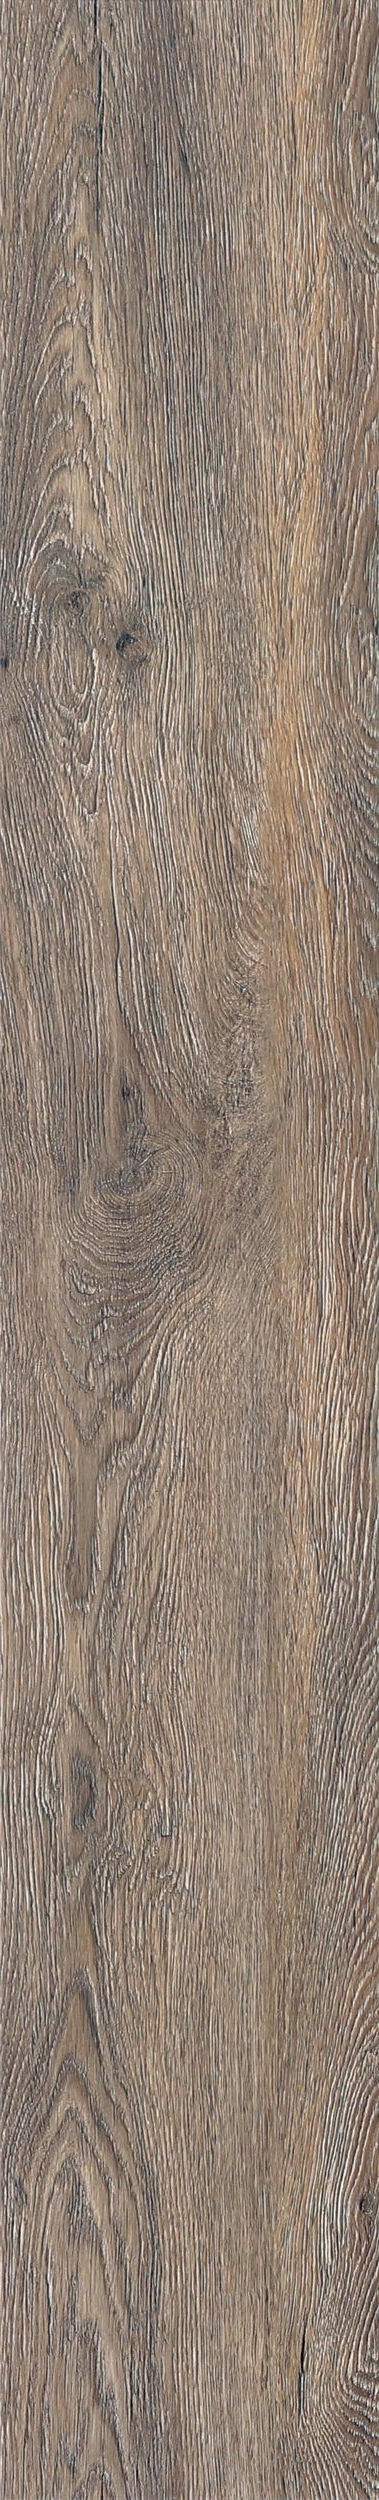 003 Weathered Oak